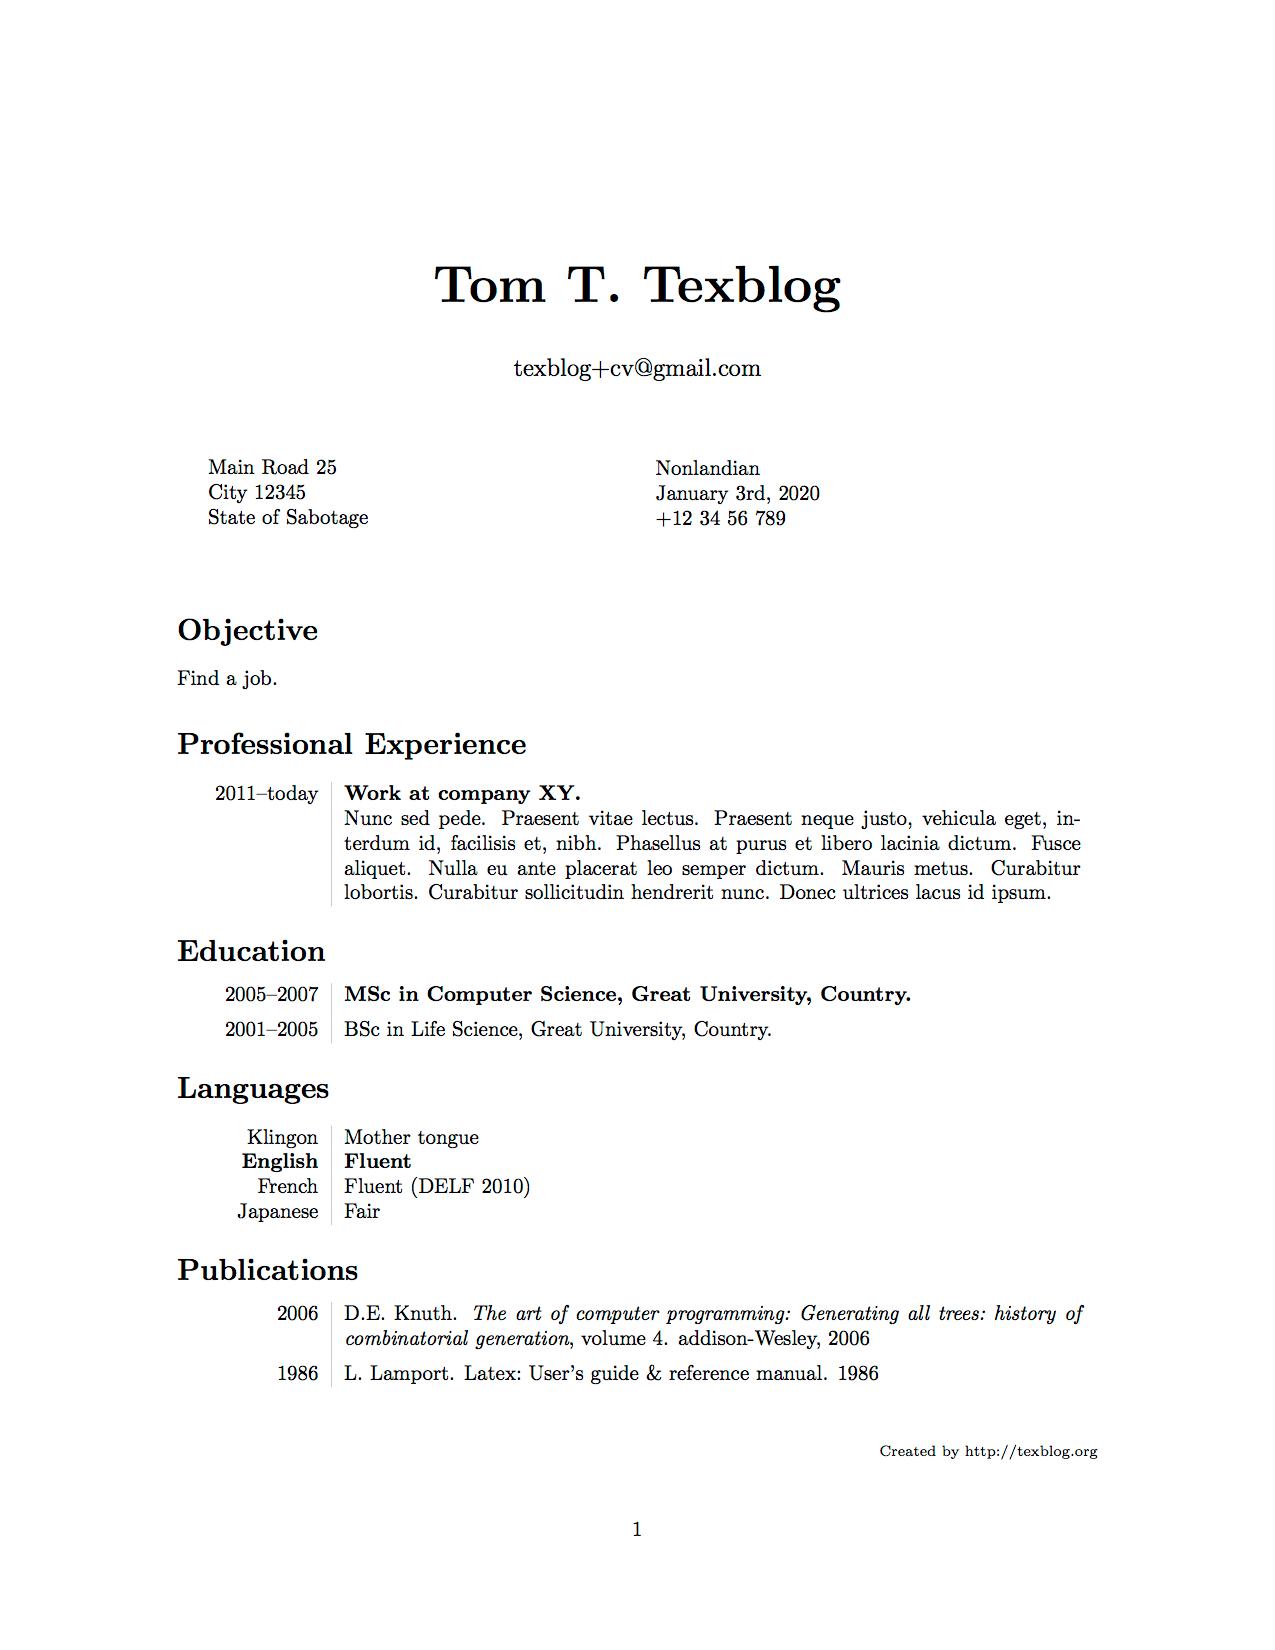 Writing A Cv In Latex Texblog